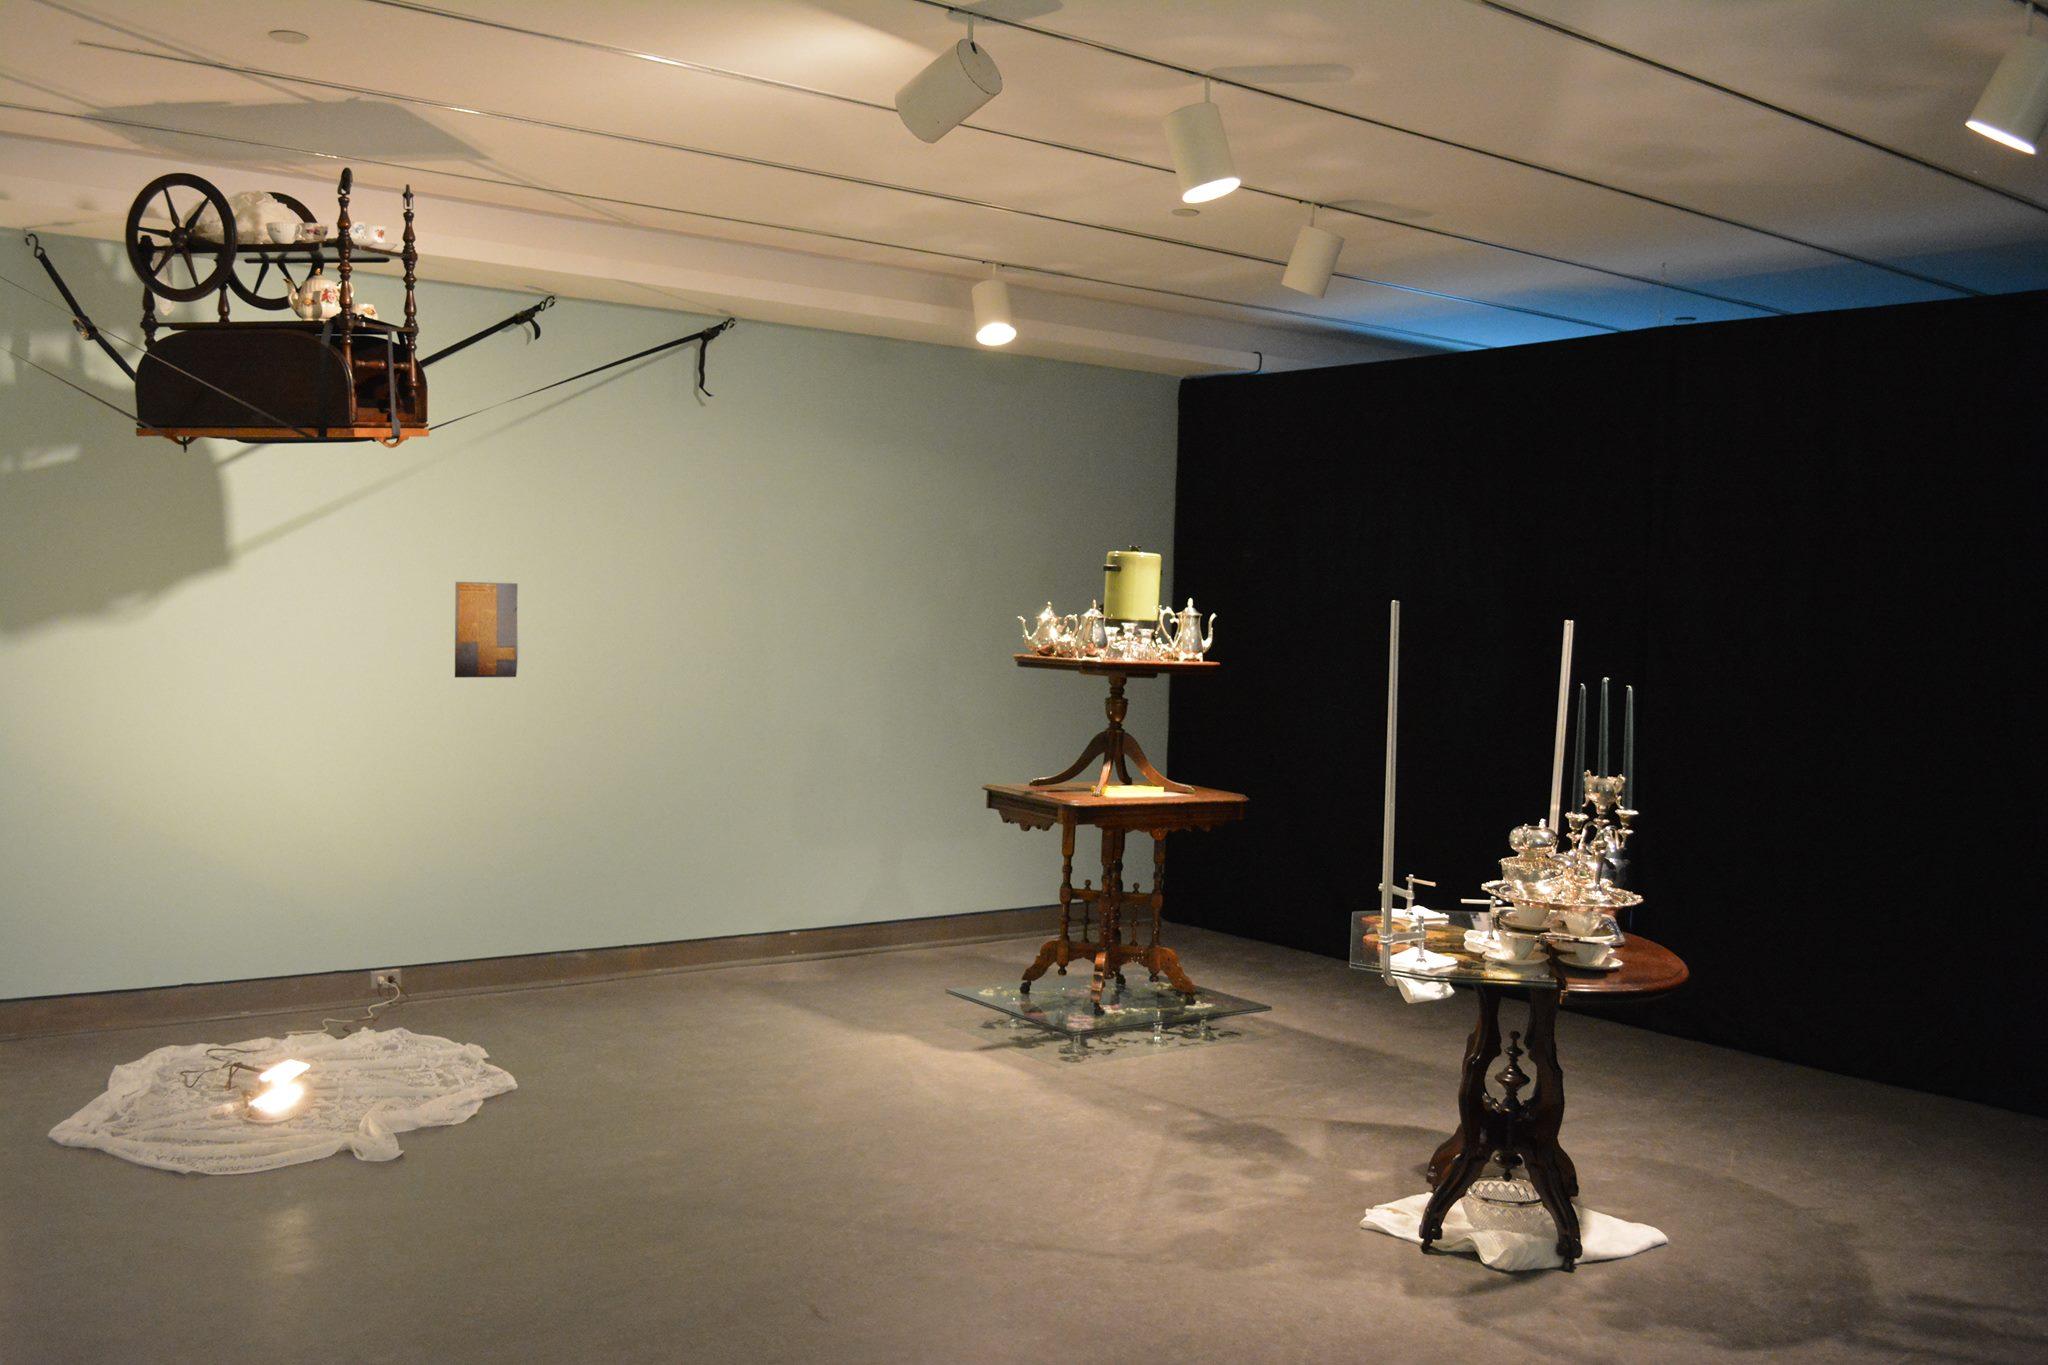 Jon Sasaki, Two Roads Diverged in a Wood, 2015, installation view, Ottawa Art Gallery, Ontario, Canada.